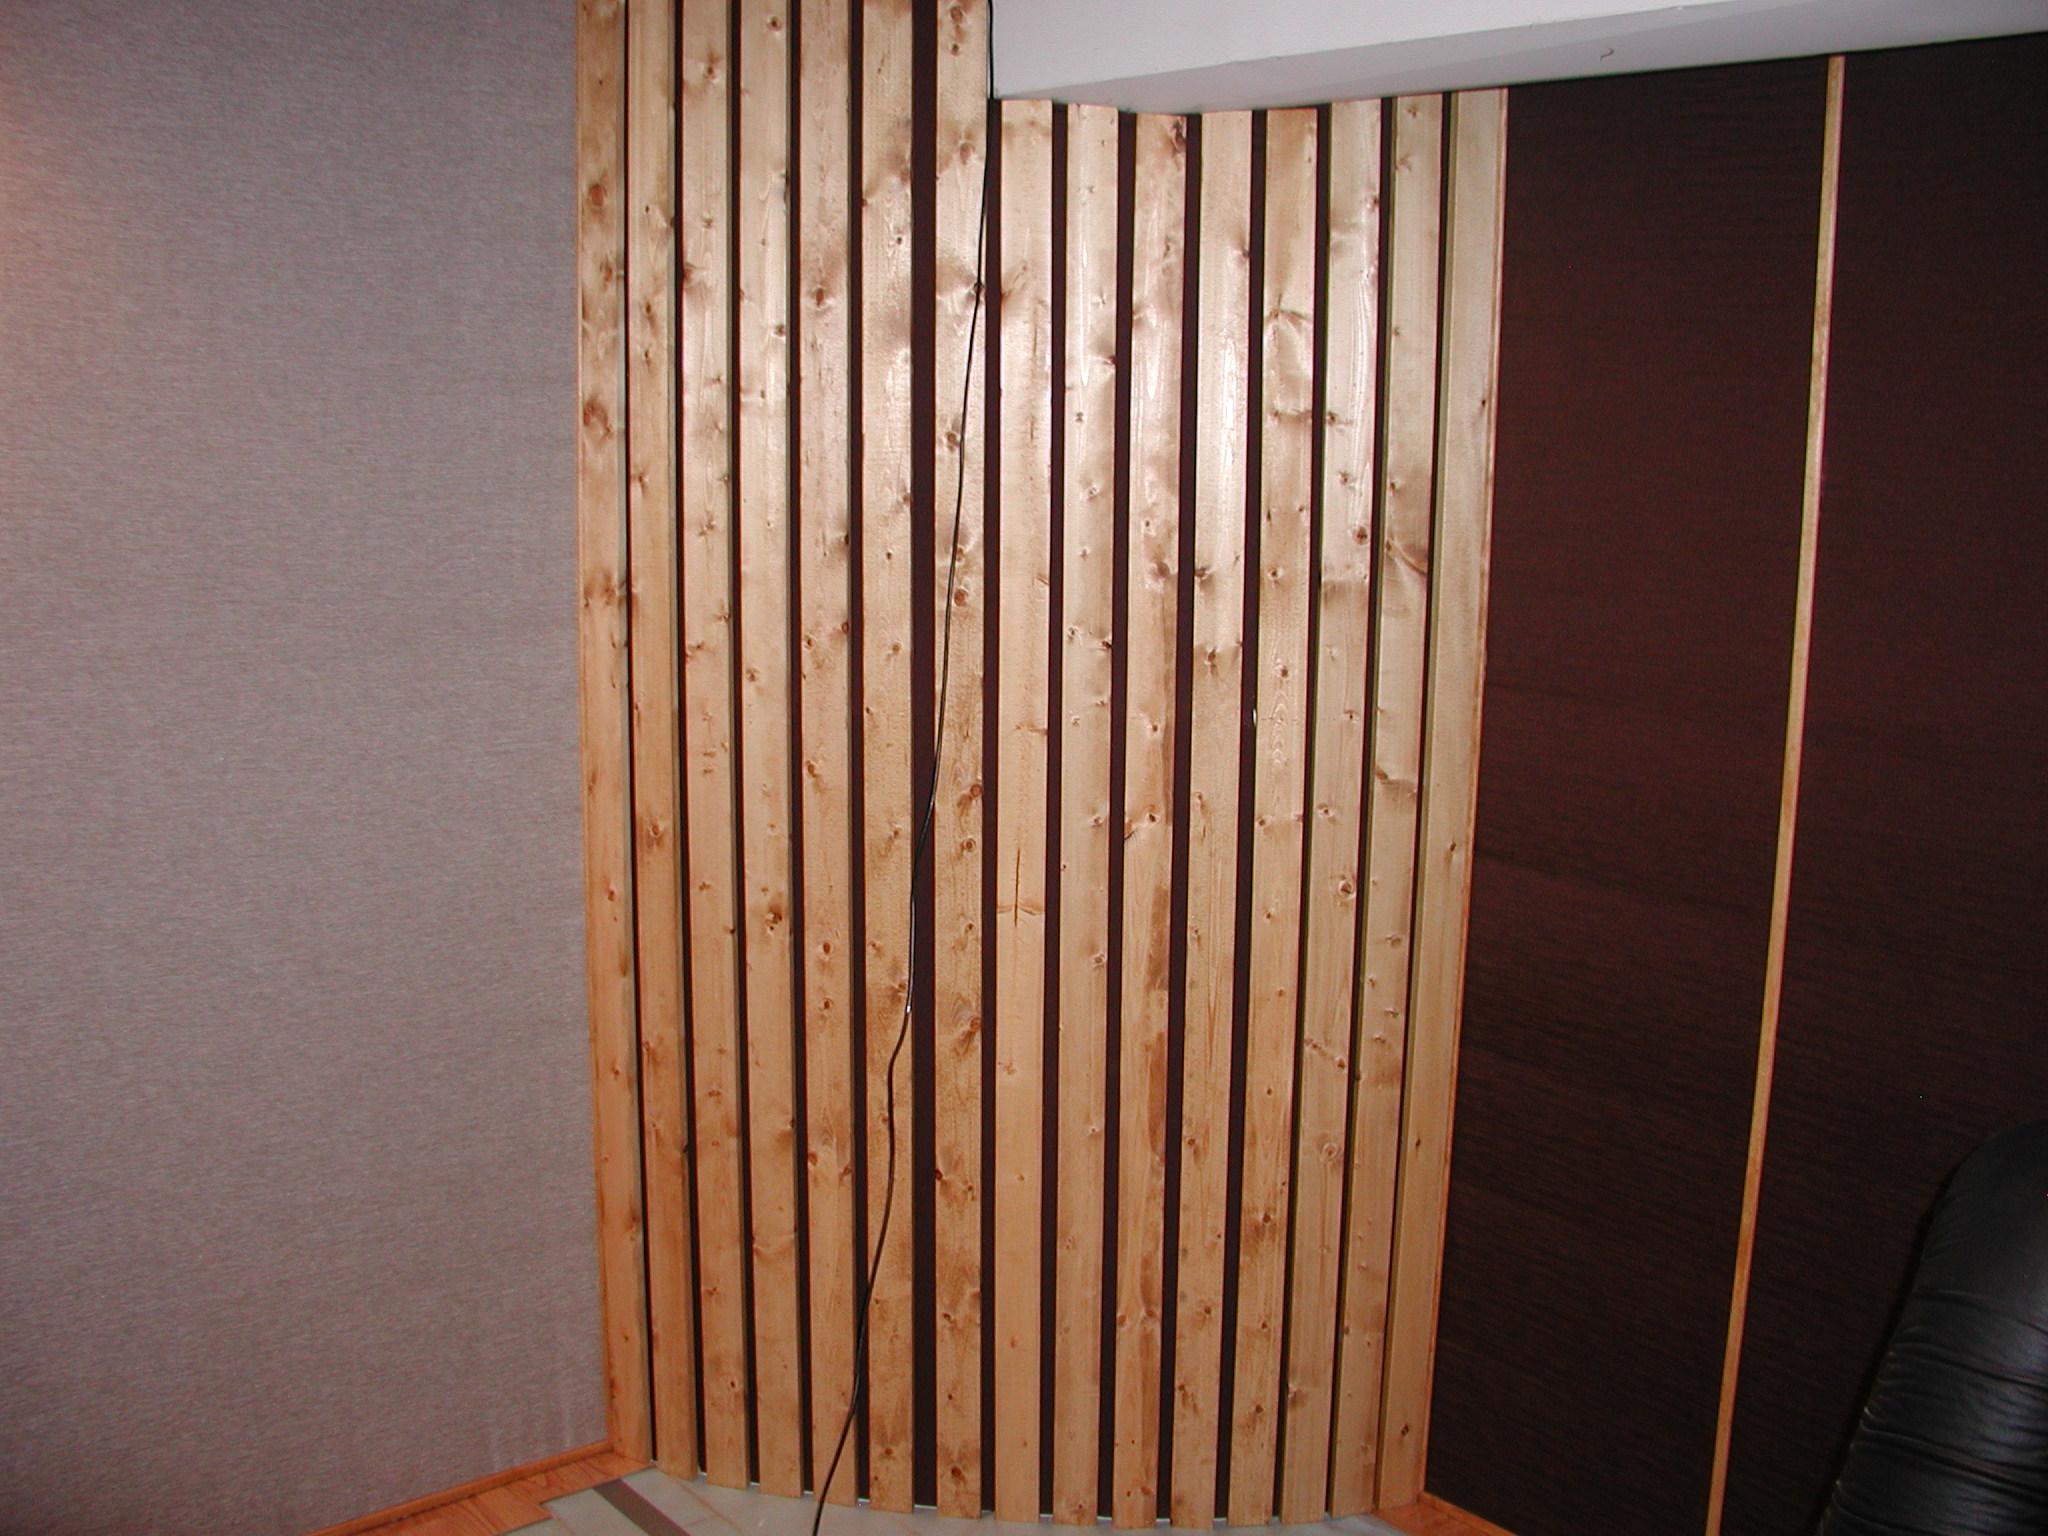 https://www.gearslutz.com/board/attachments/bass-traps-acoustic-panels-foam-etc/312260d1349488246-my-corner-bass-traps-pictures-mr-brandt-near-completion-2-9-2012-003.jpg